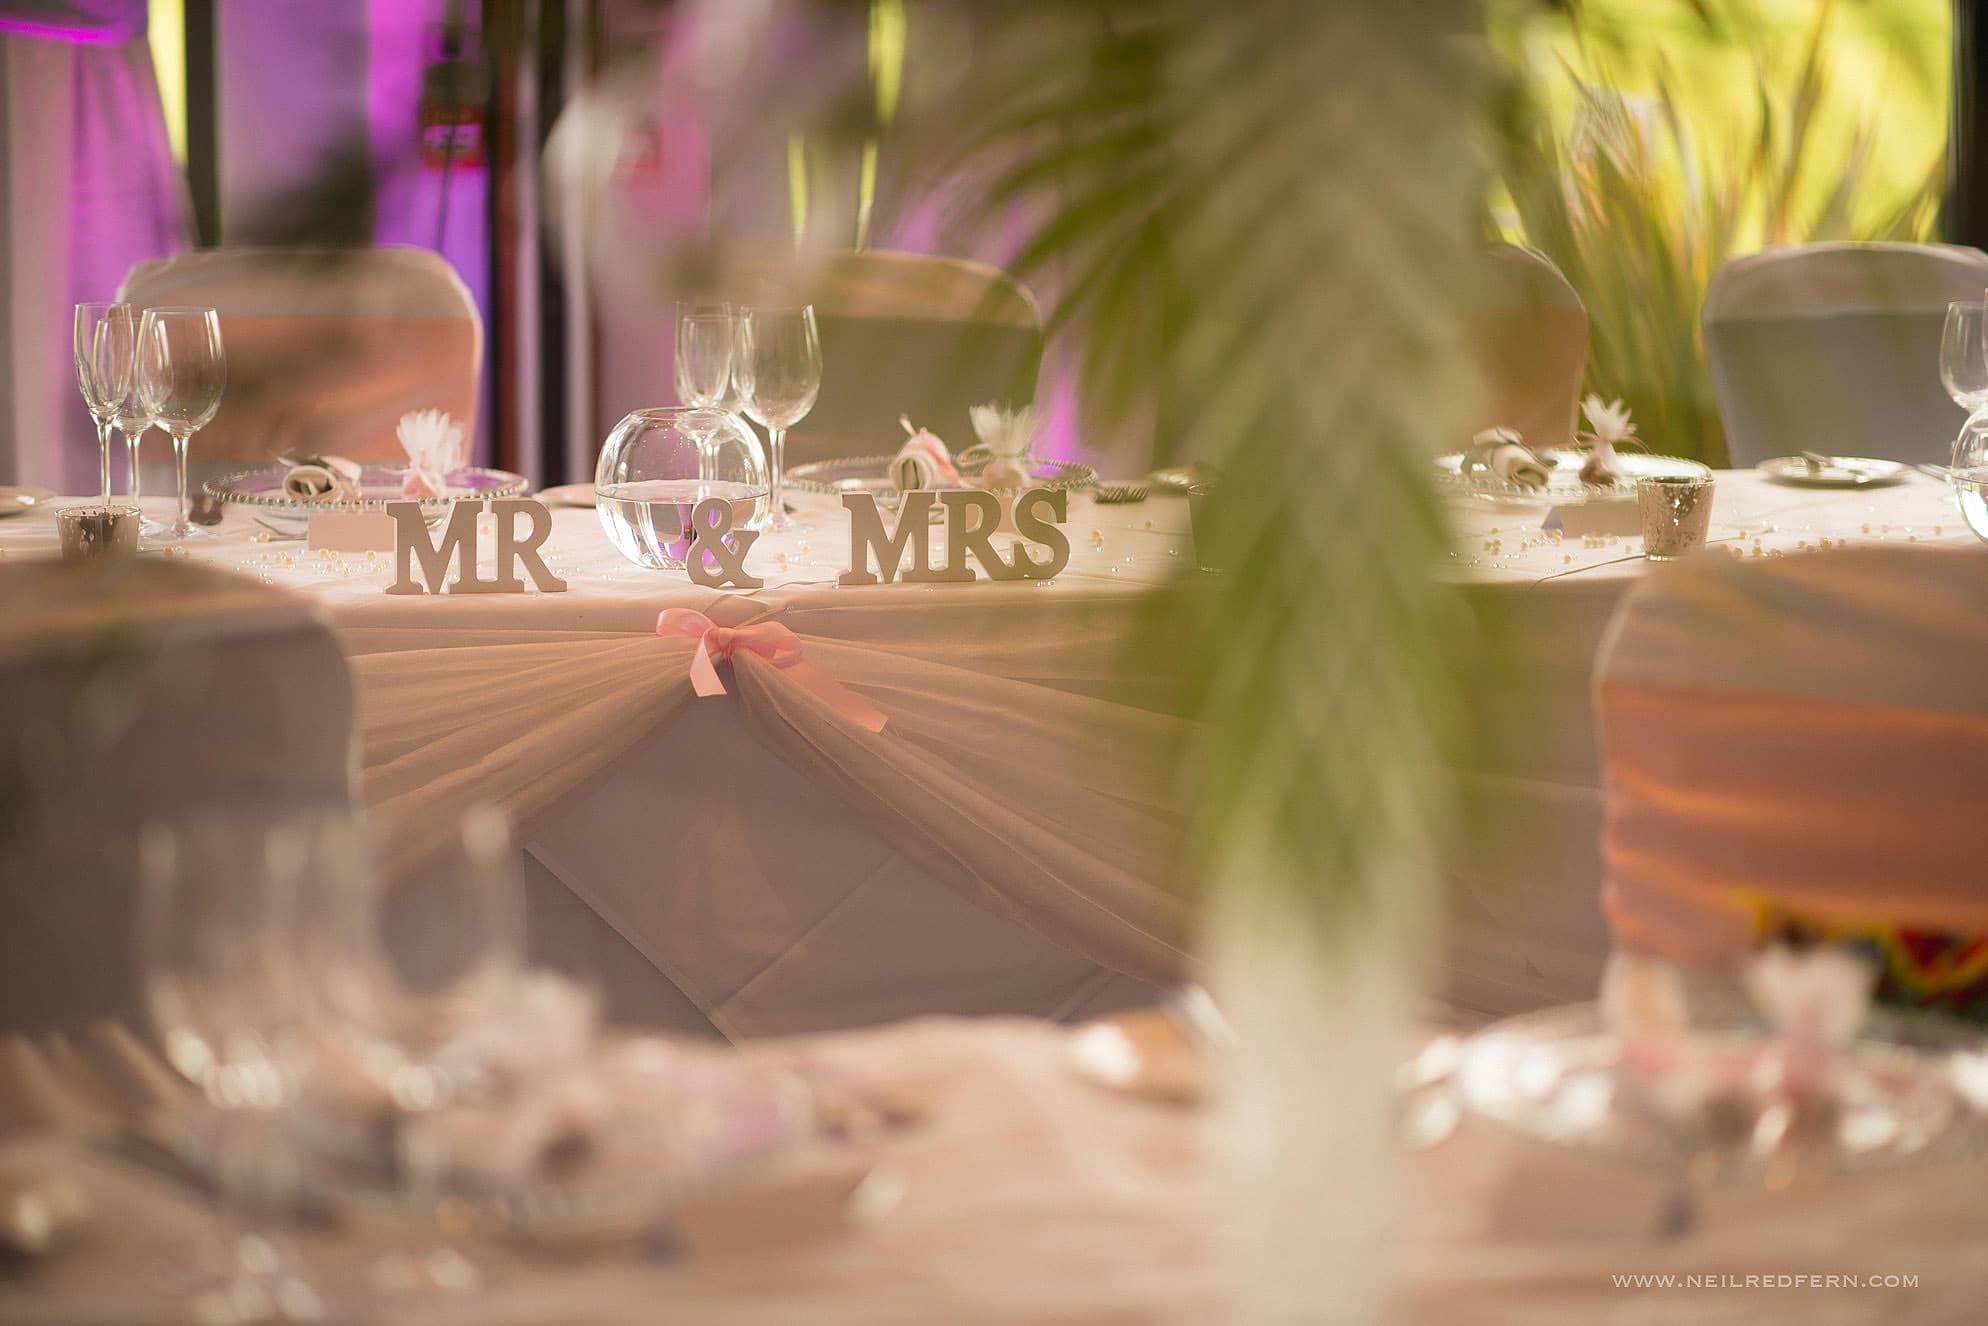 Rookery Hall wedding photographs 01